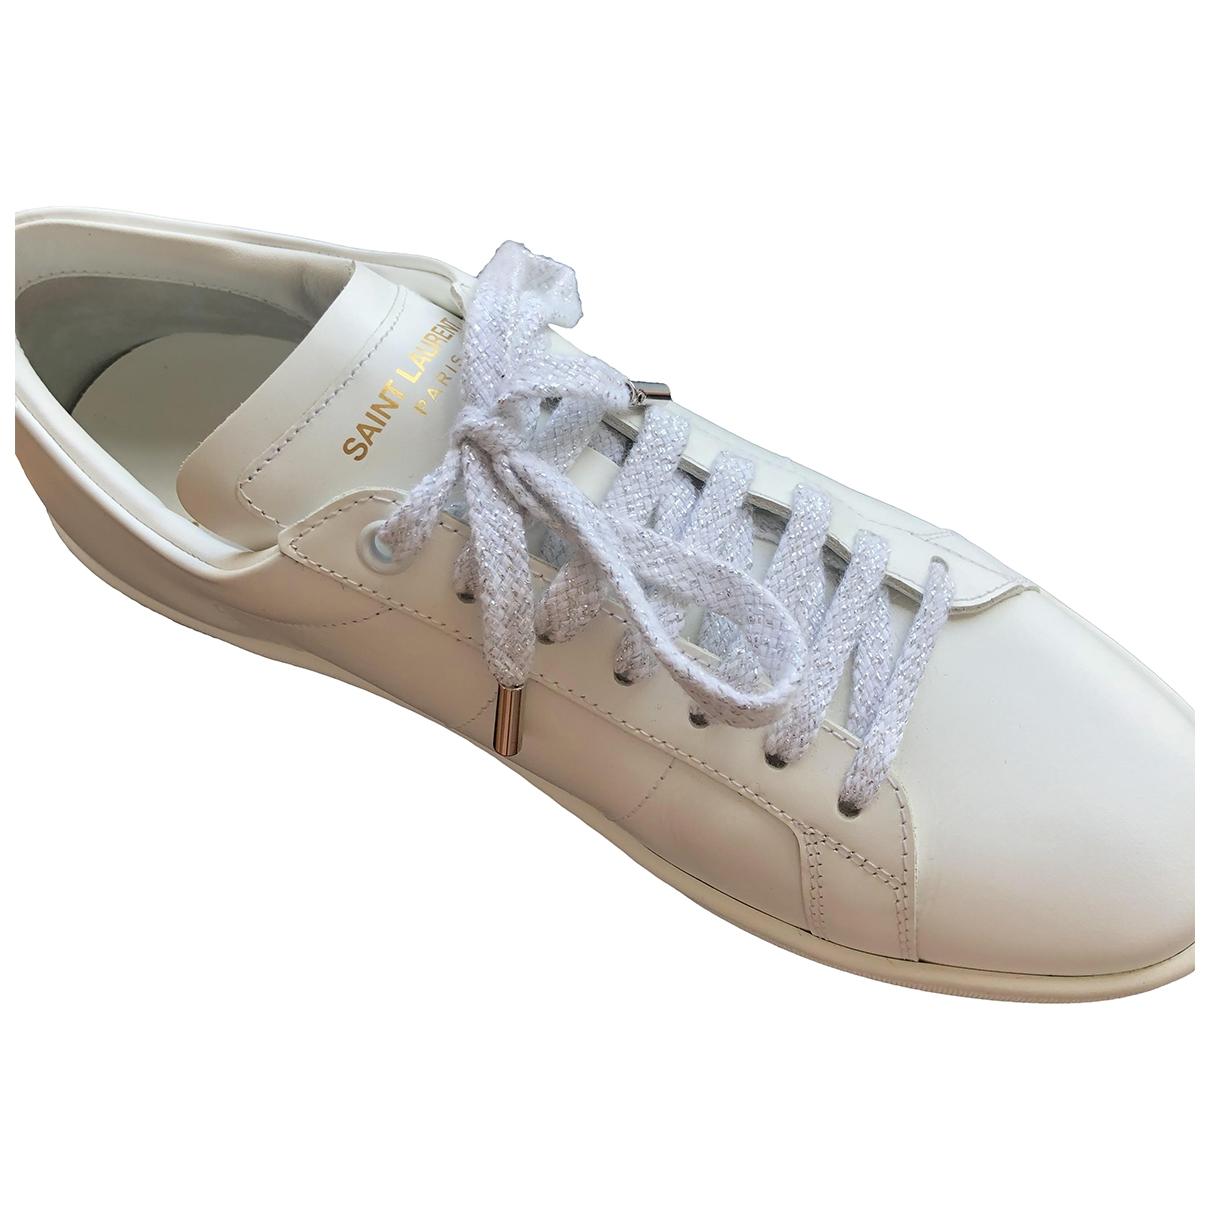 Saint Laurent SL/01 White Leather Trainers for Women 38 EU